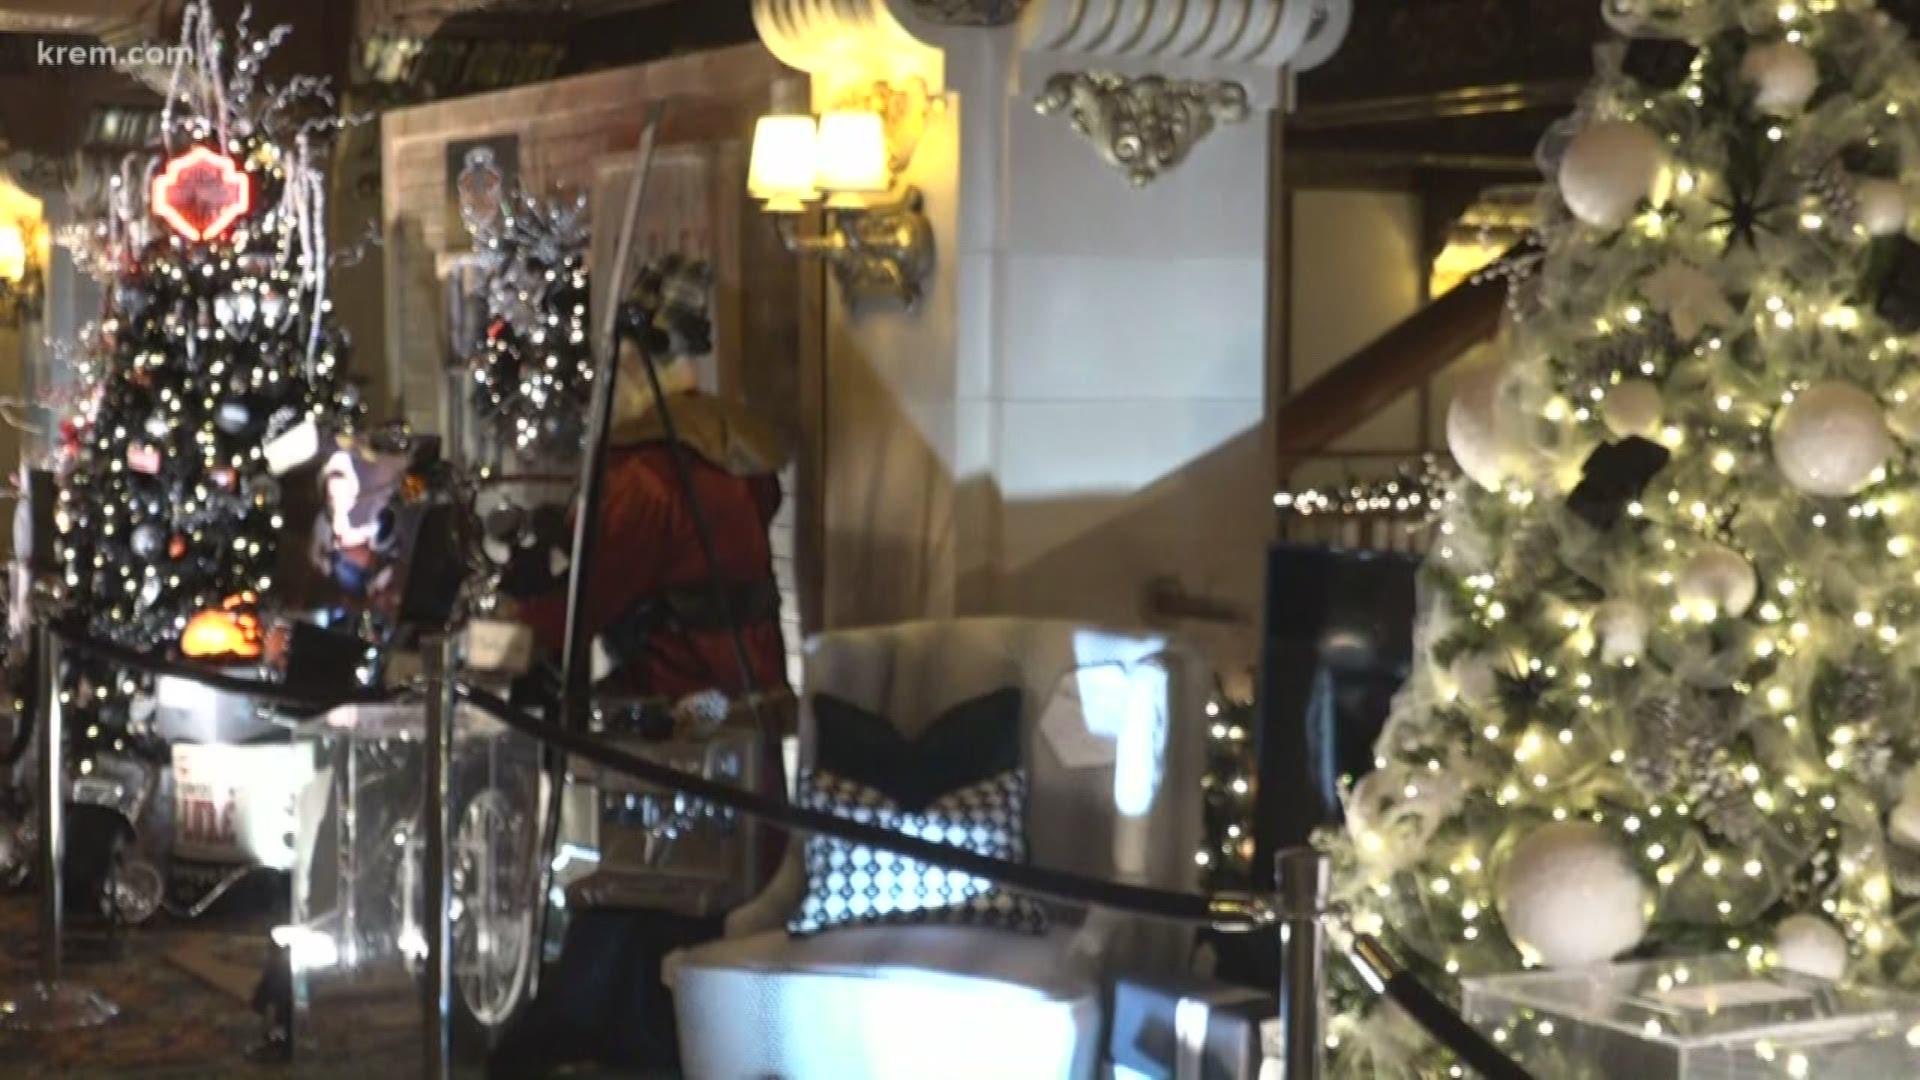 Valle Monte Christmas Tree Elegance 2020 Vidoe Christmas Tree Elegance returns to Davenport and River Park Square